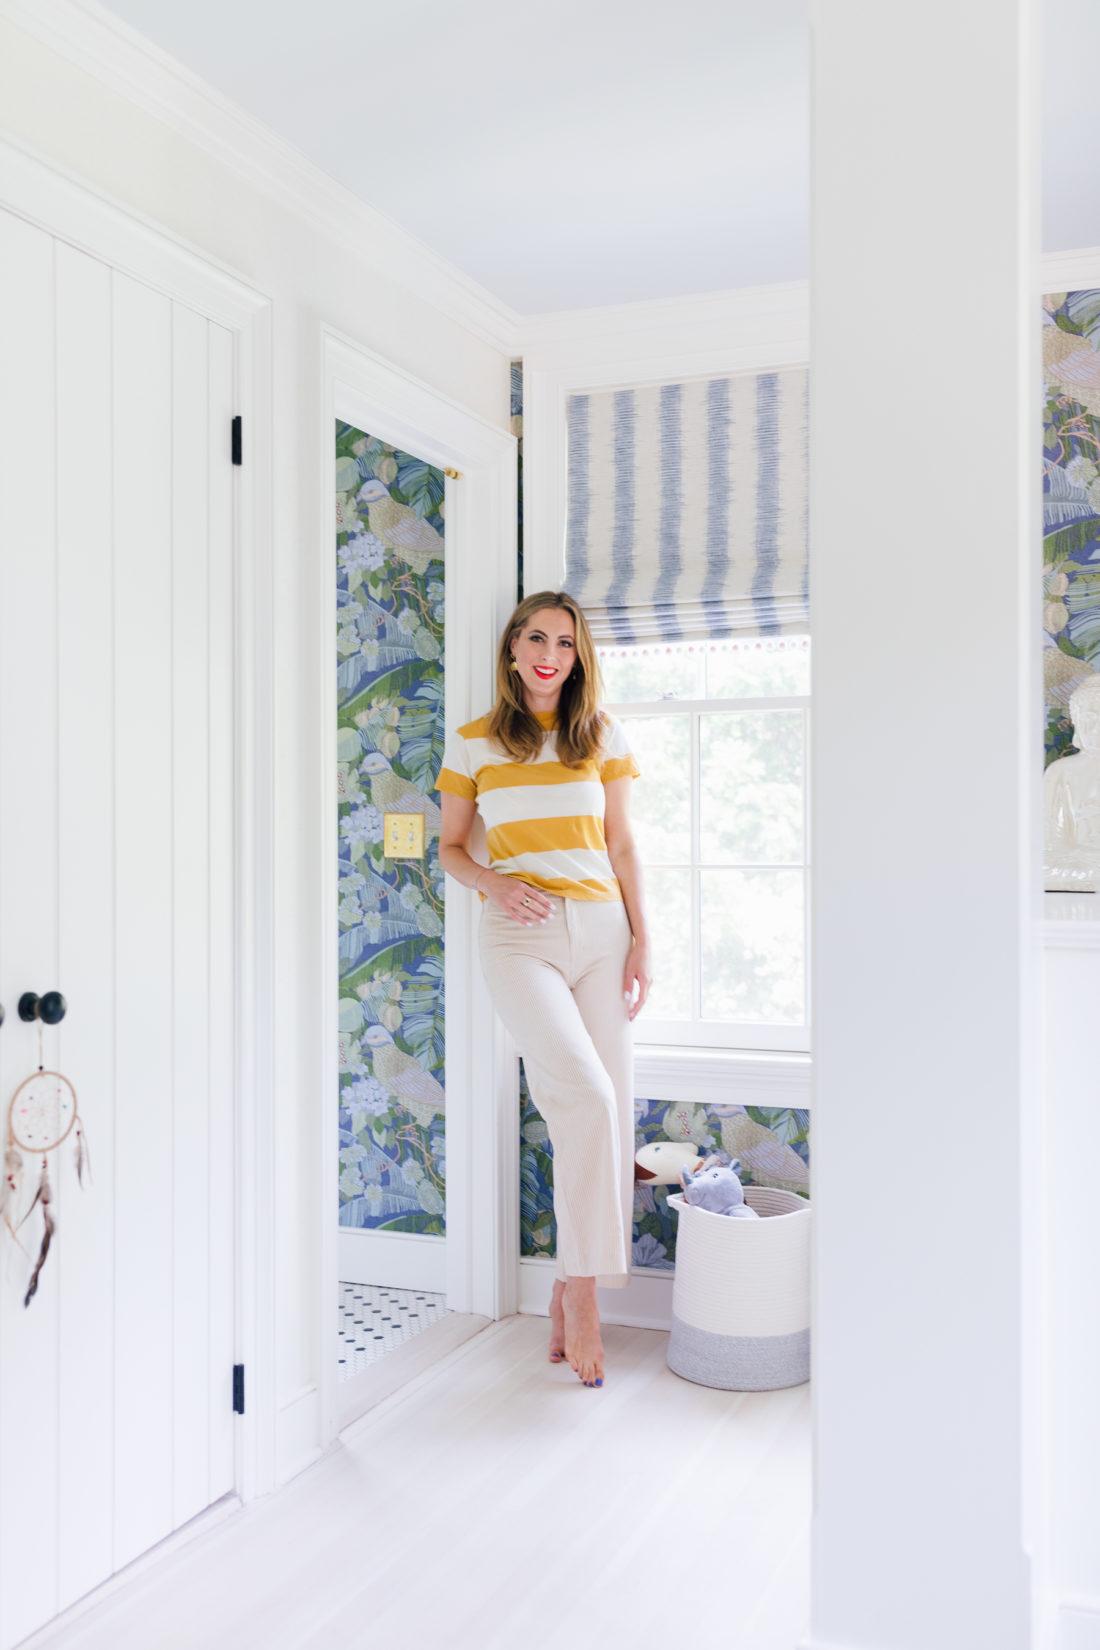 Eva Amurri Martino stands in daughter Marlowe's brand new bedroom